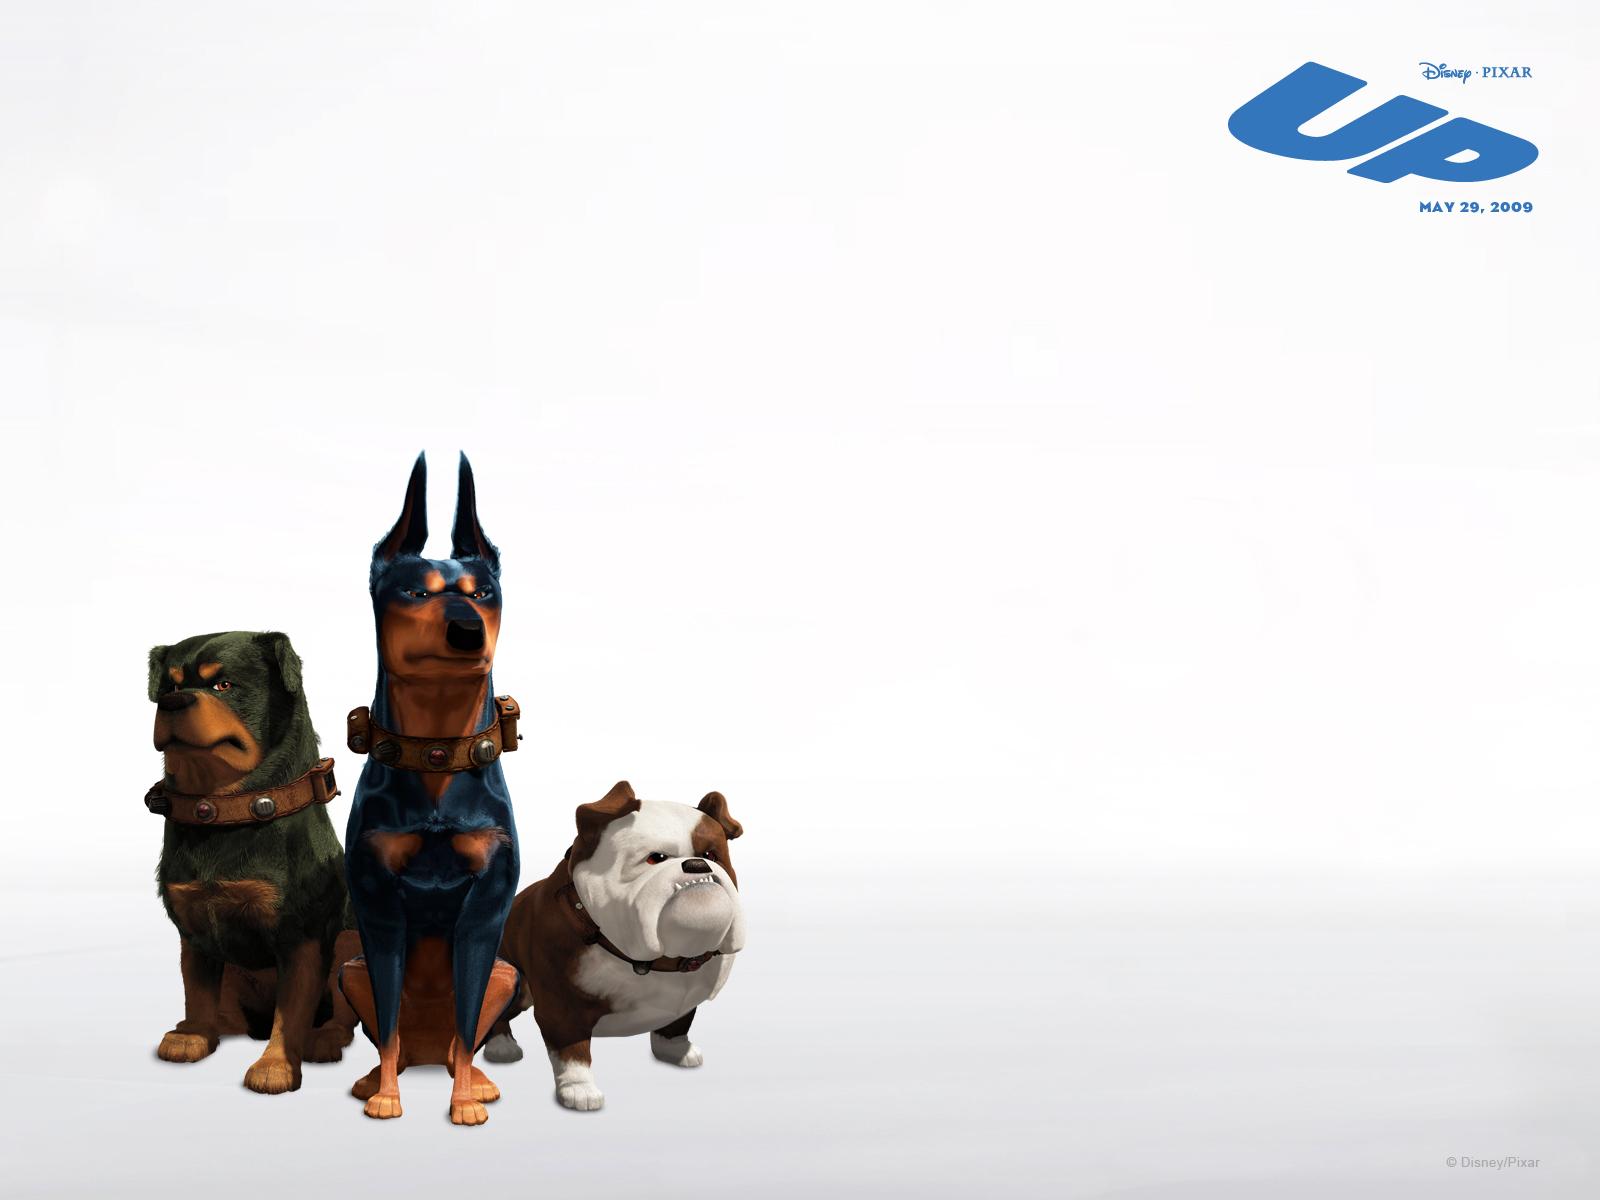 Disney Pixar Up Wallpapers Poster Movie Wallpaper 1600x1200